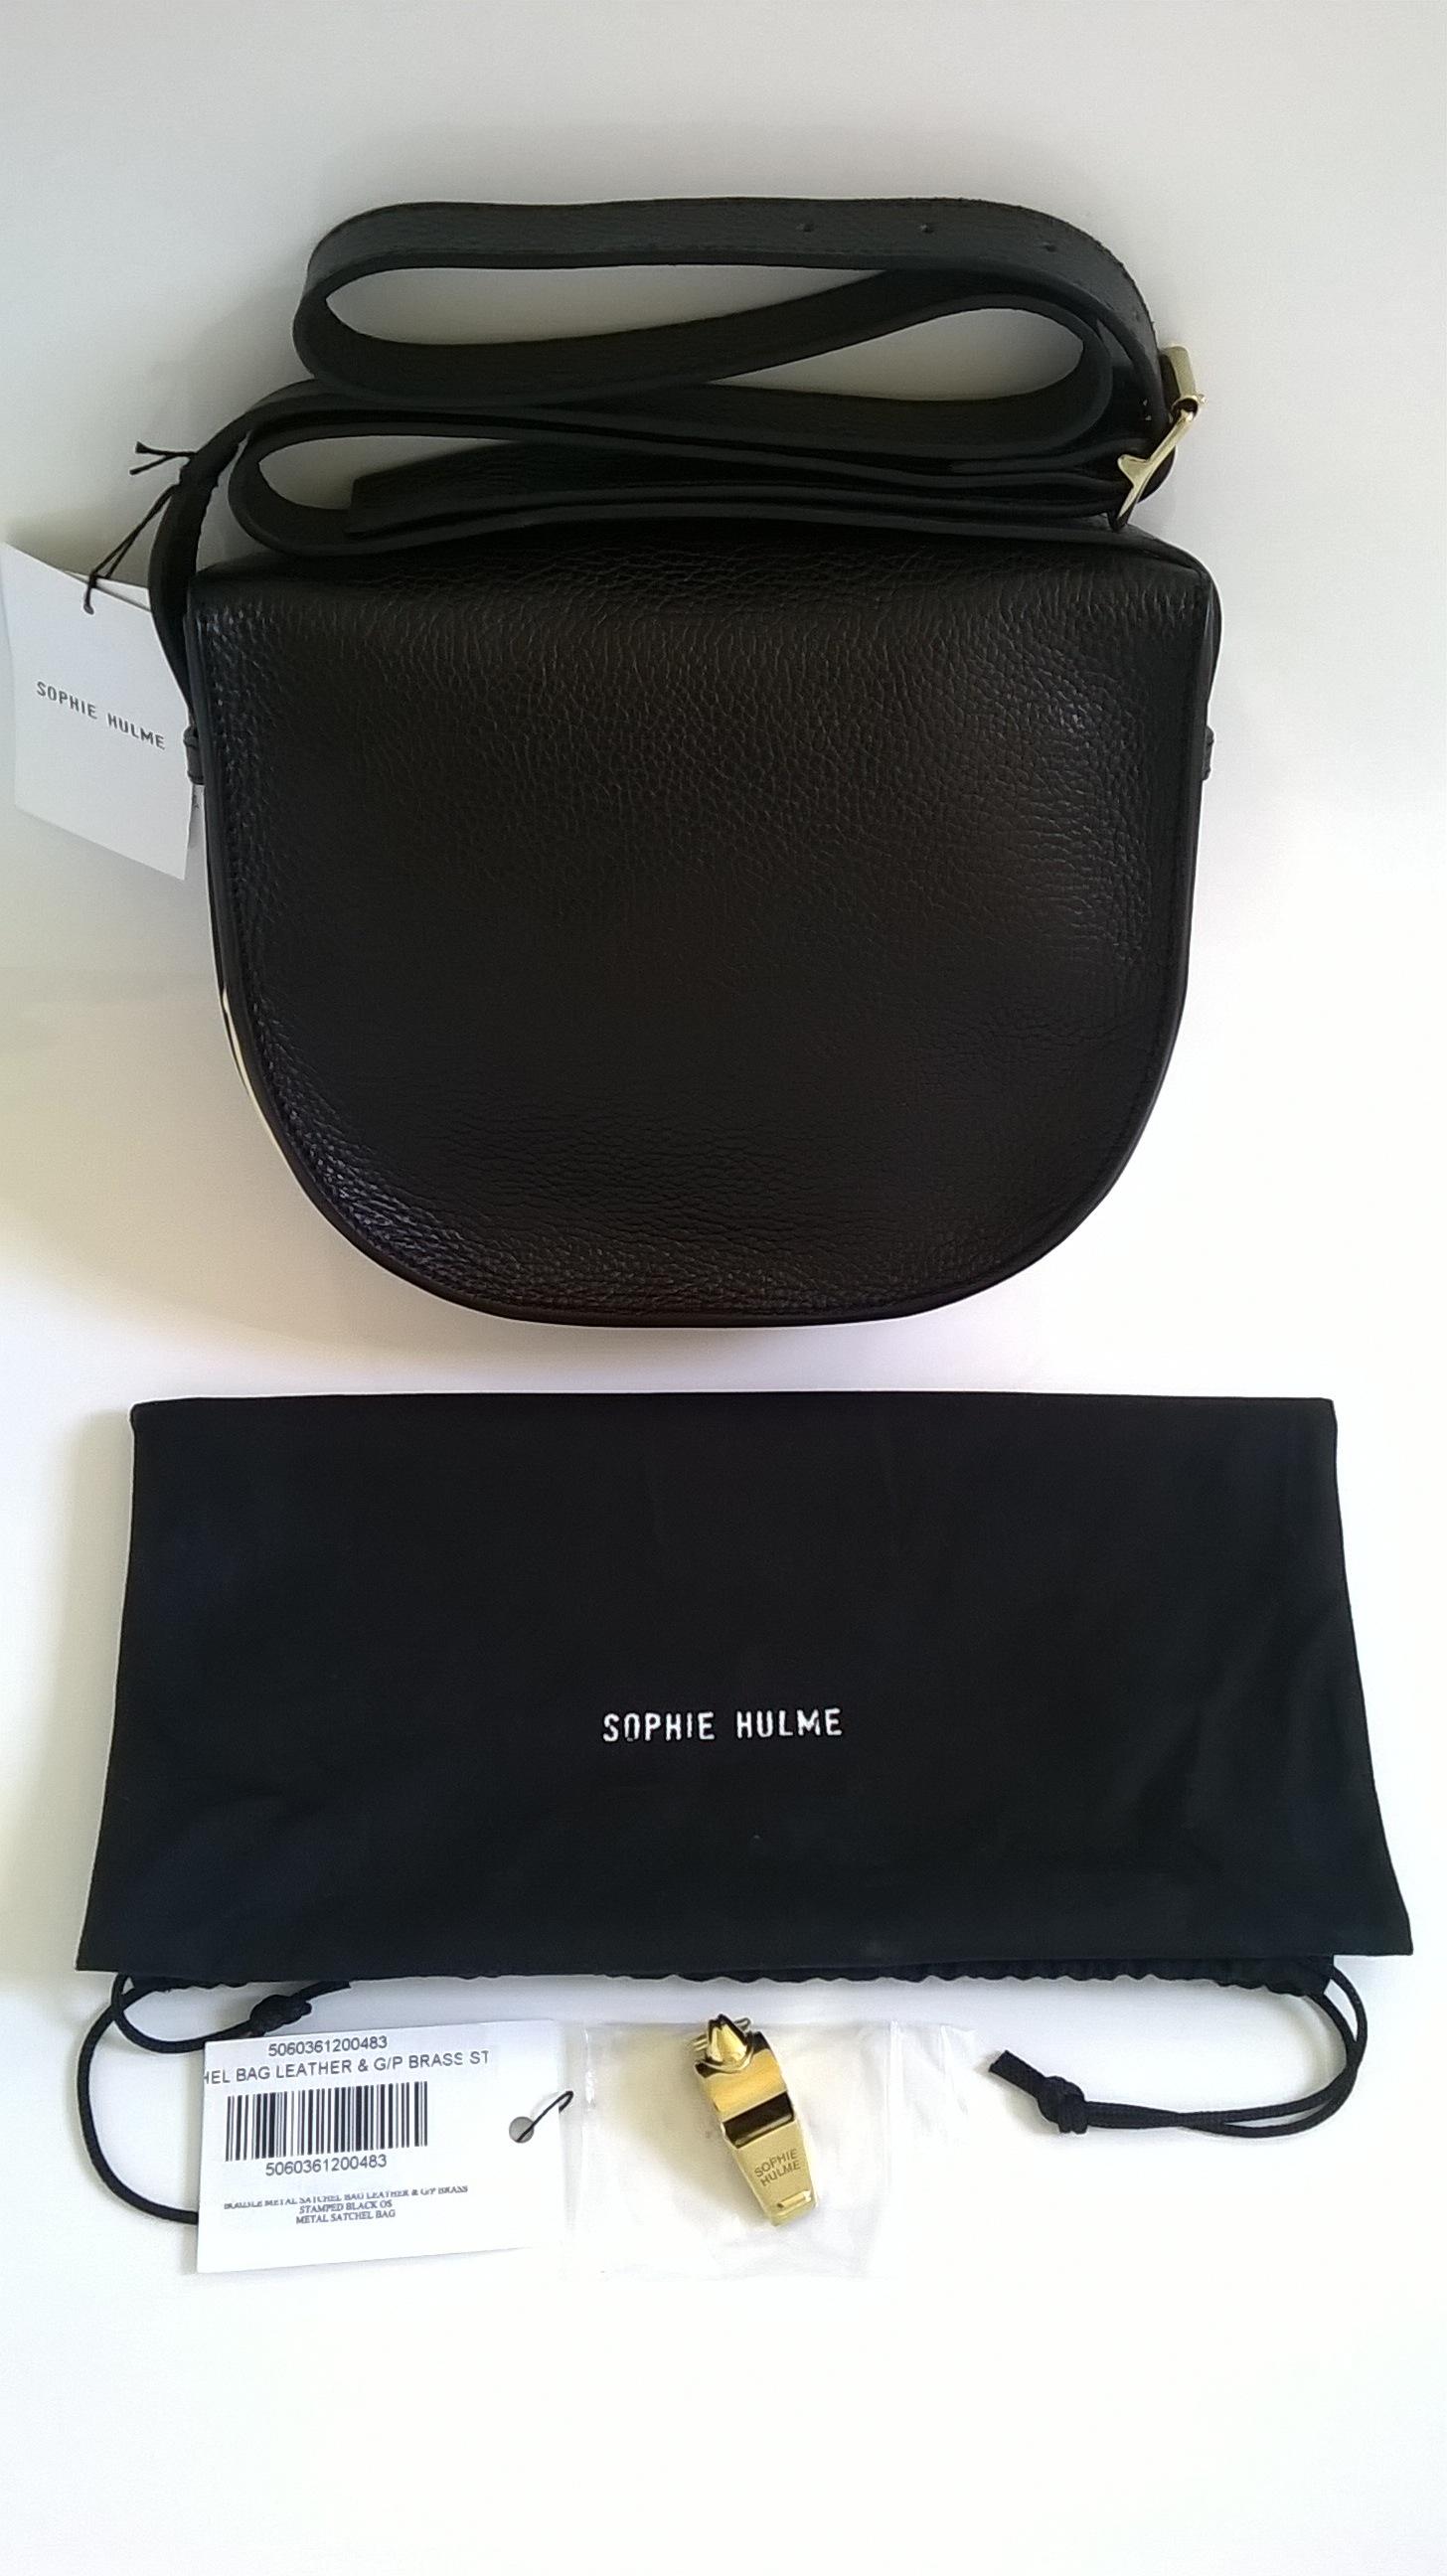 Sophie Hulme Black Clutch Bag